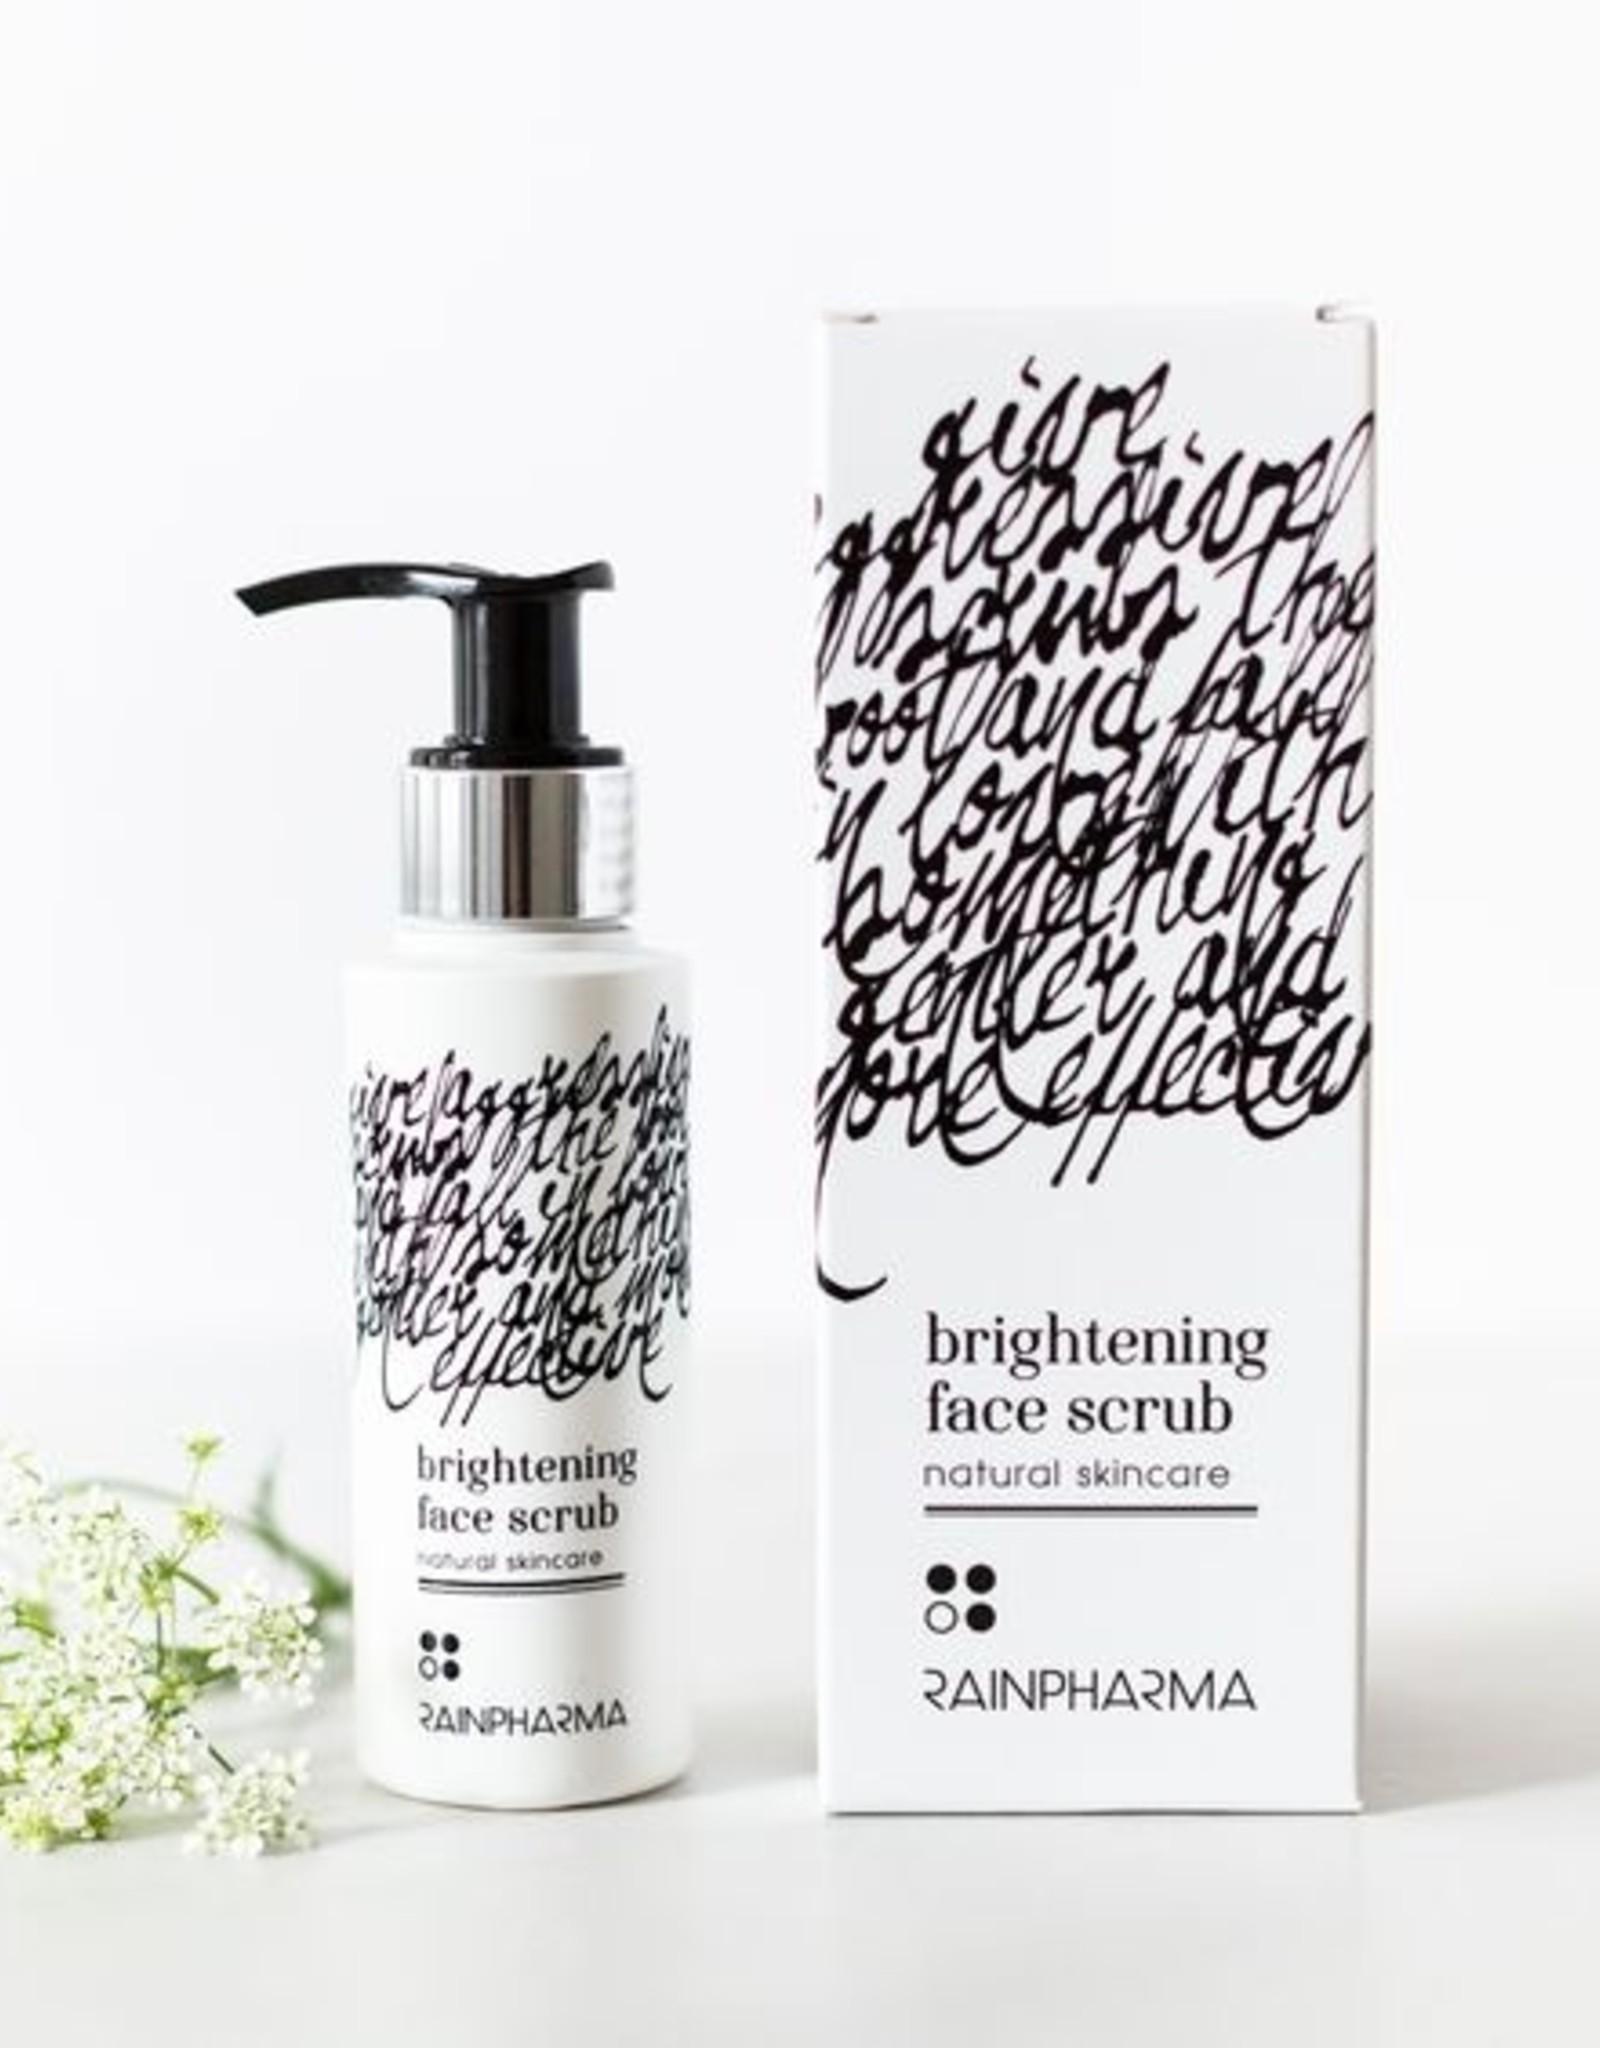 RainPharma Brightening Face Scrub 100ml - Rainpharma